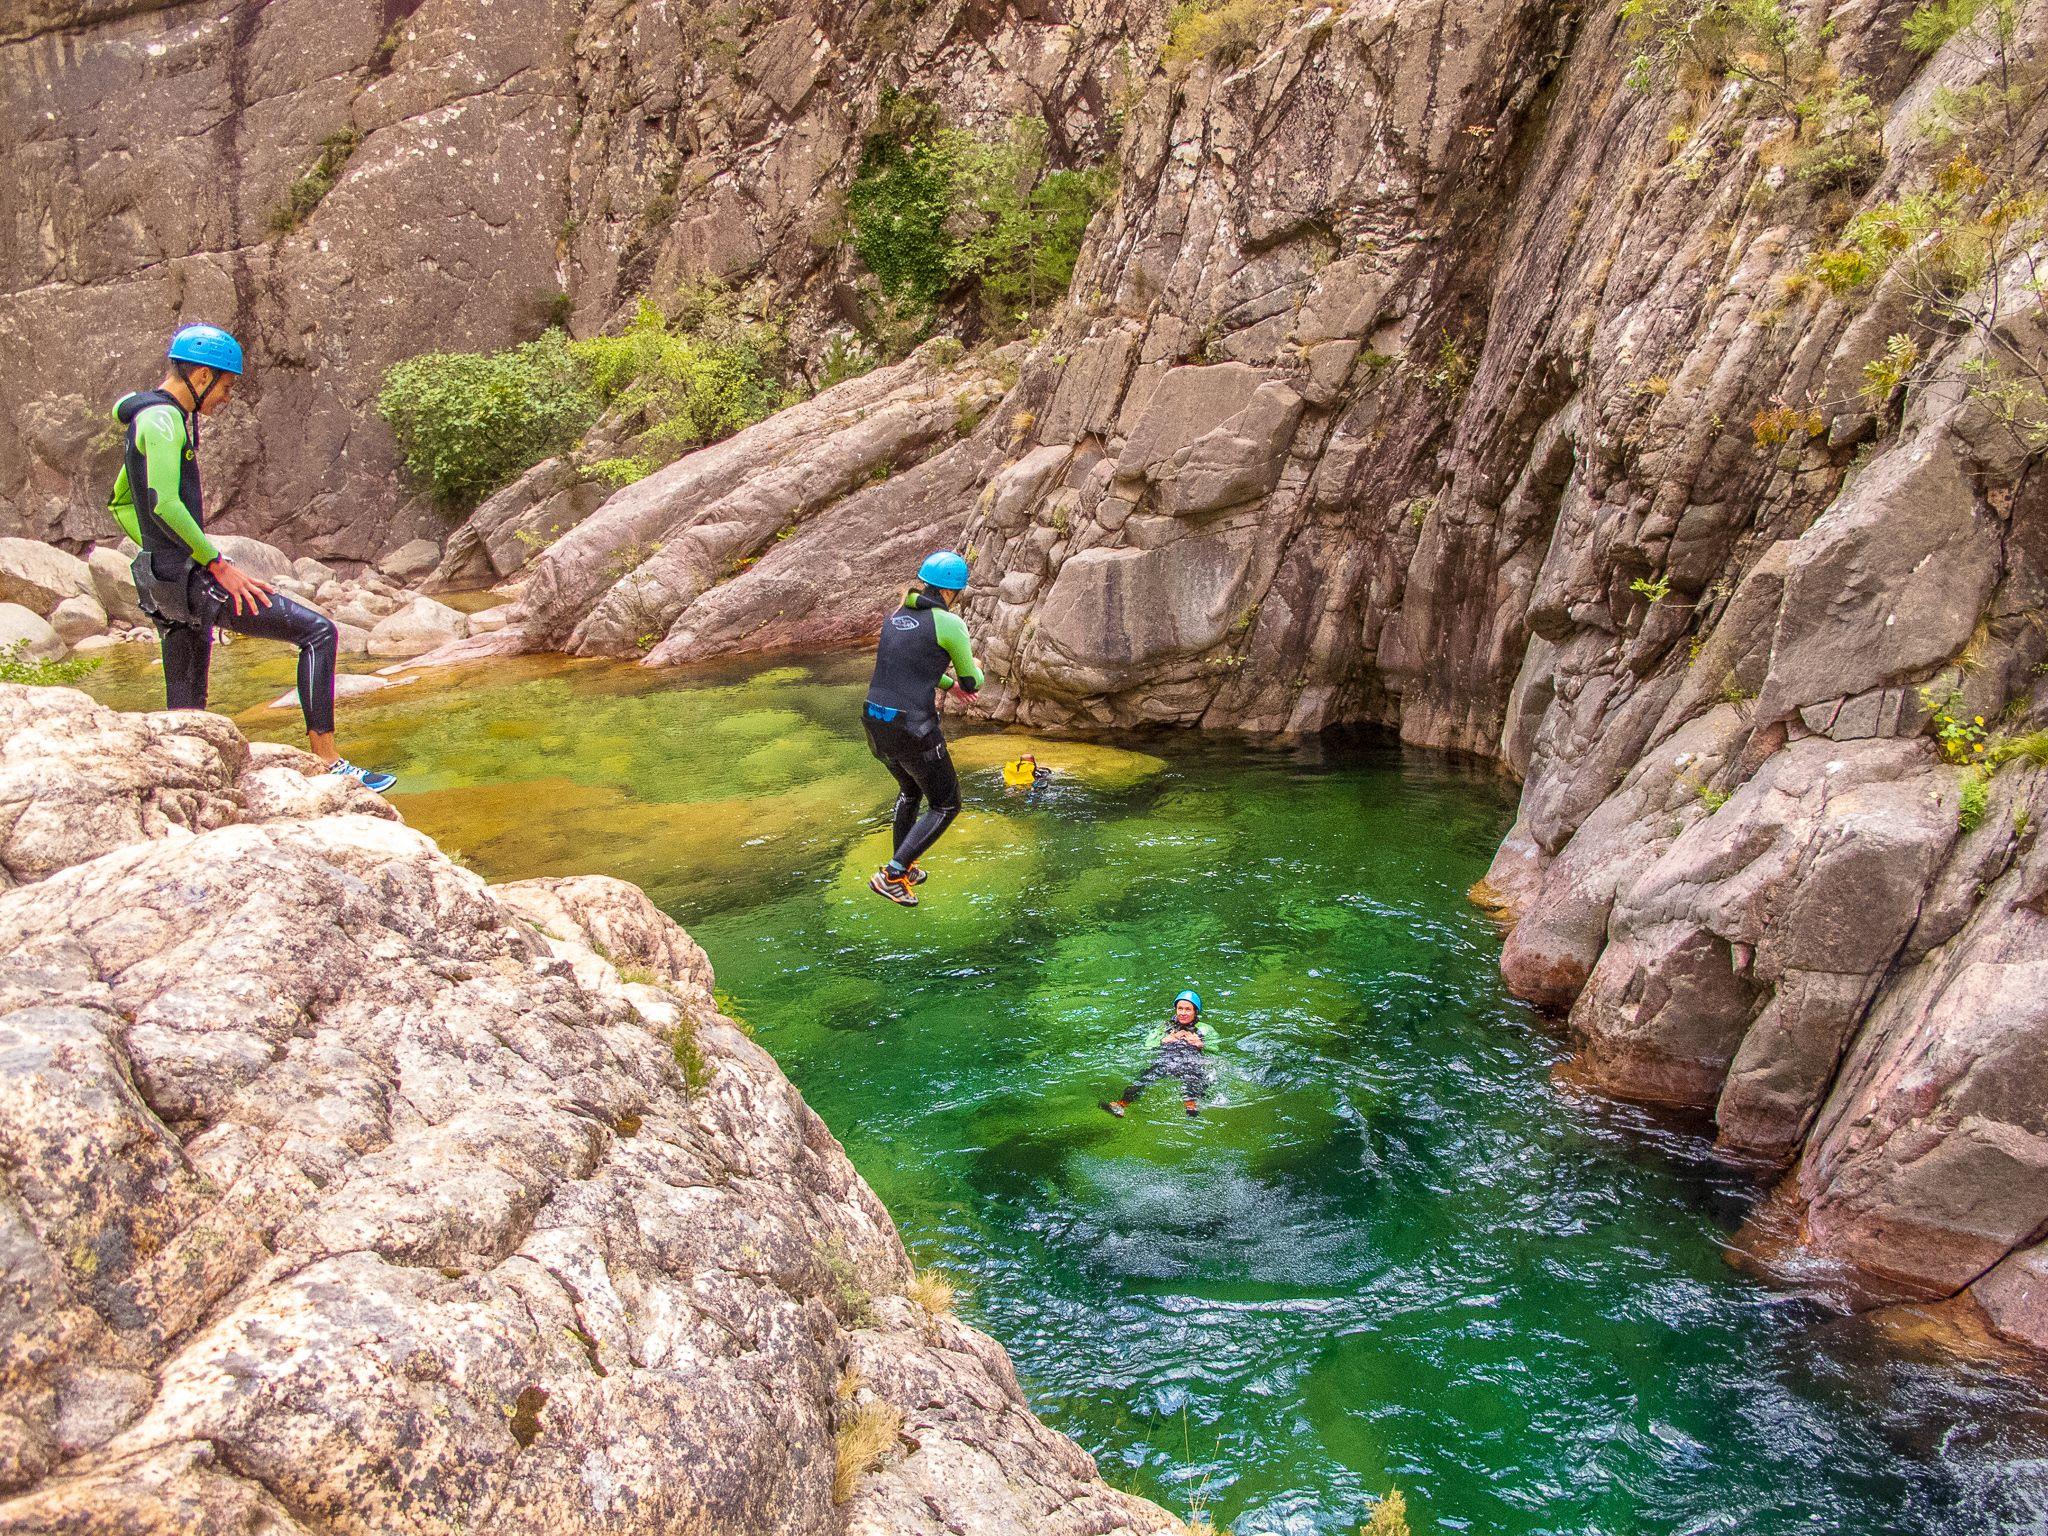 Klettergurt Canyoning : Canyon der vacca canyons in korsika bavella